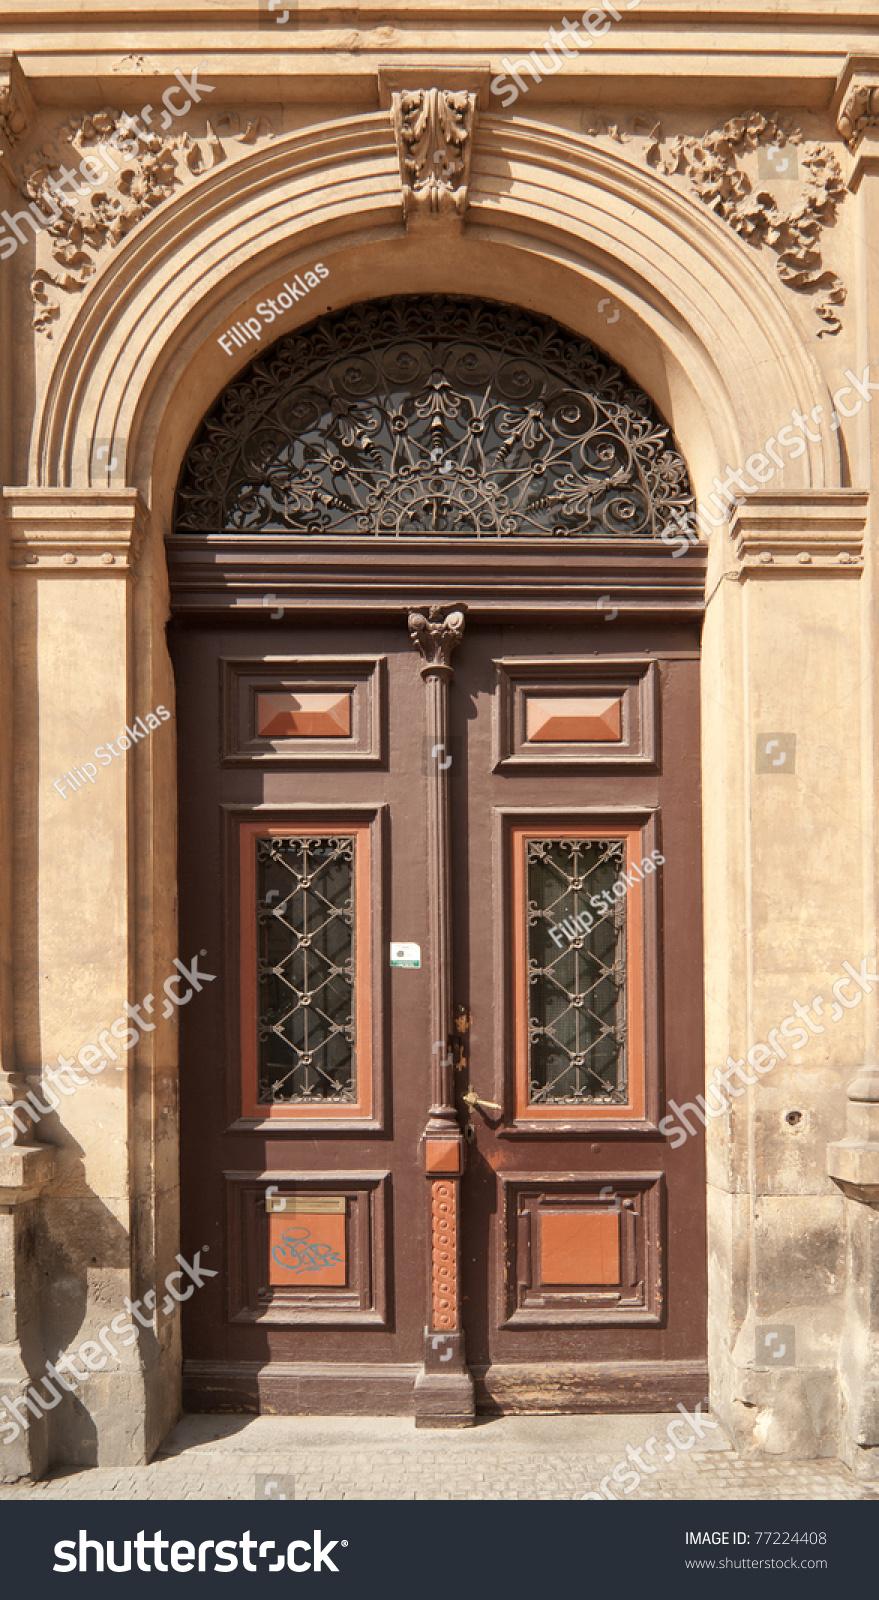 Historical ornate wooden door in a stone entry prague for Door z prague